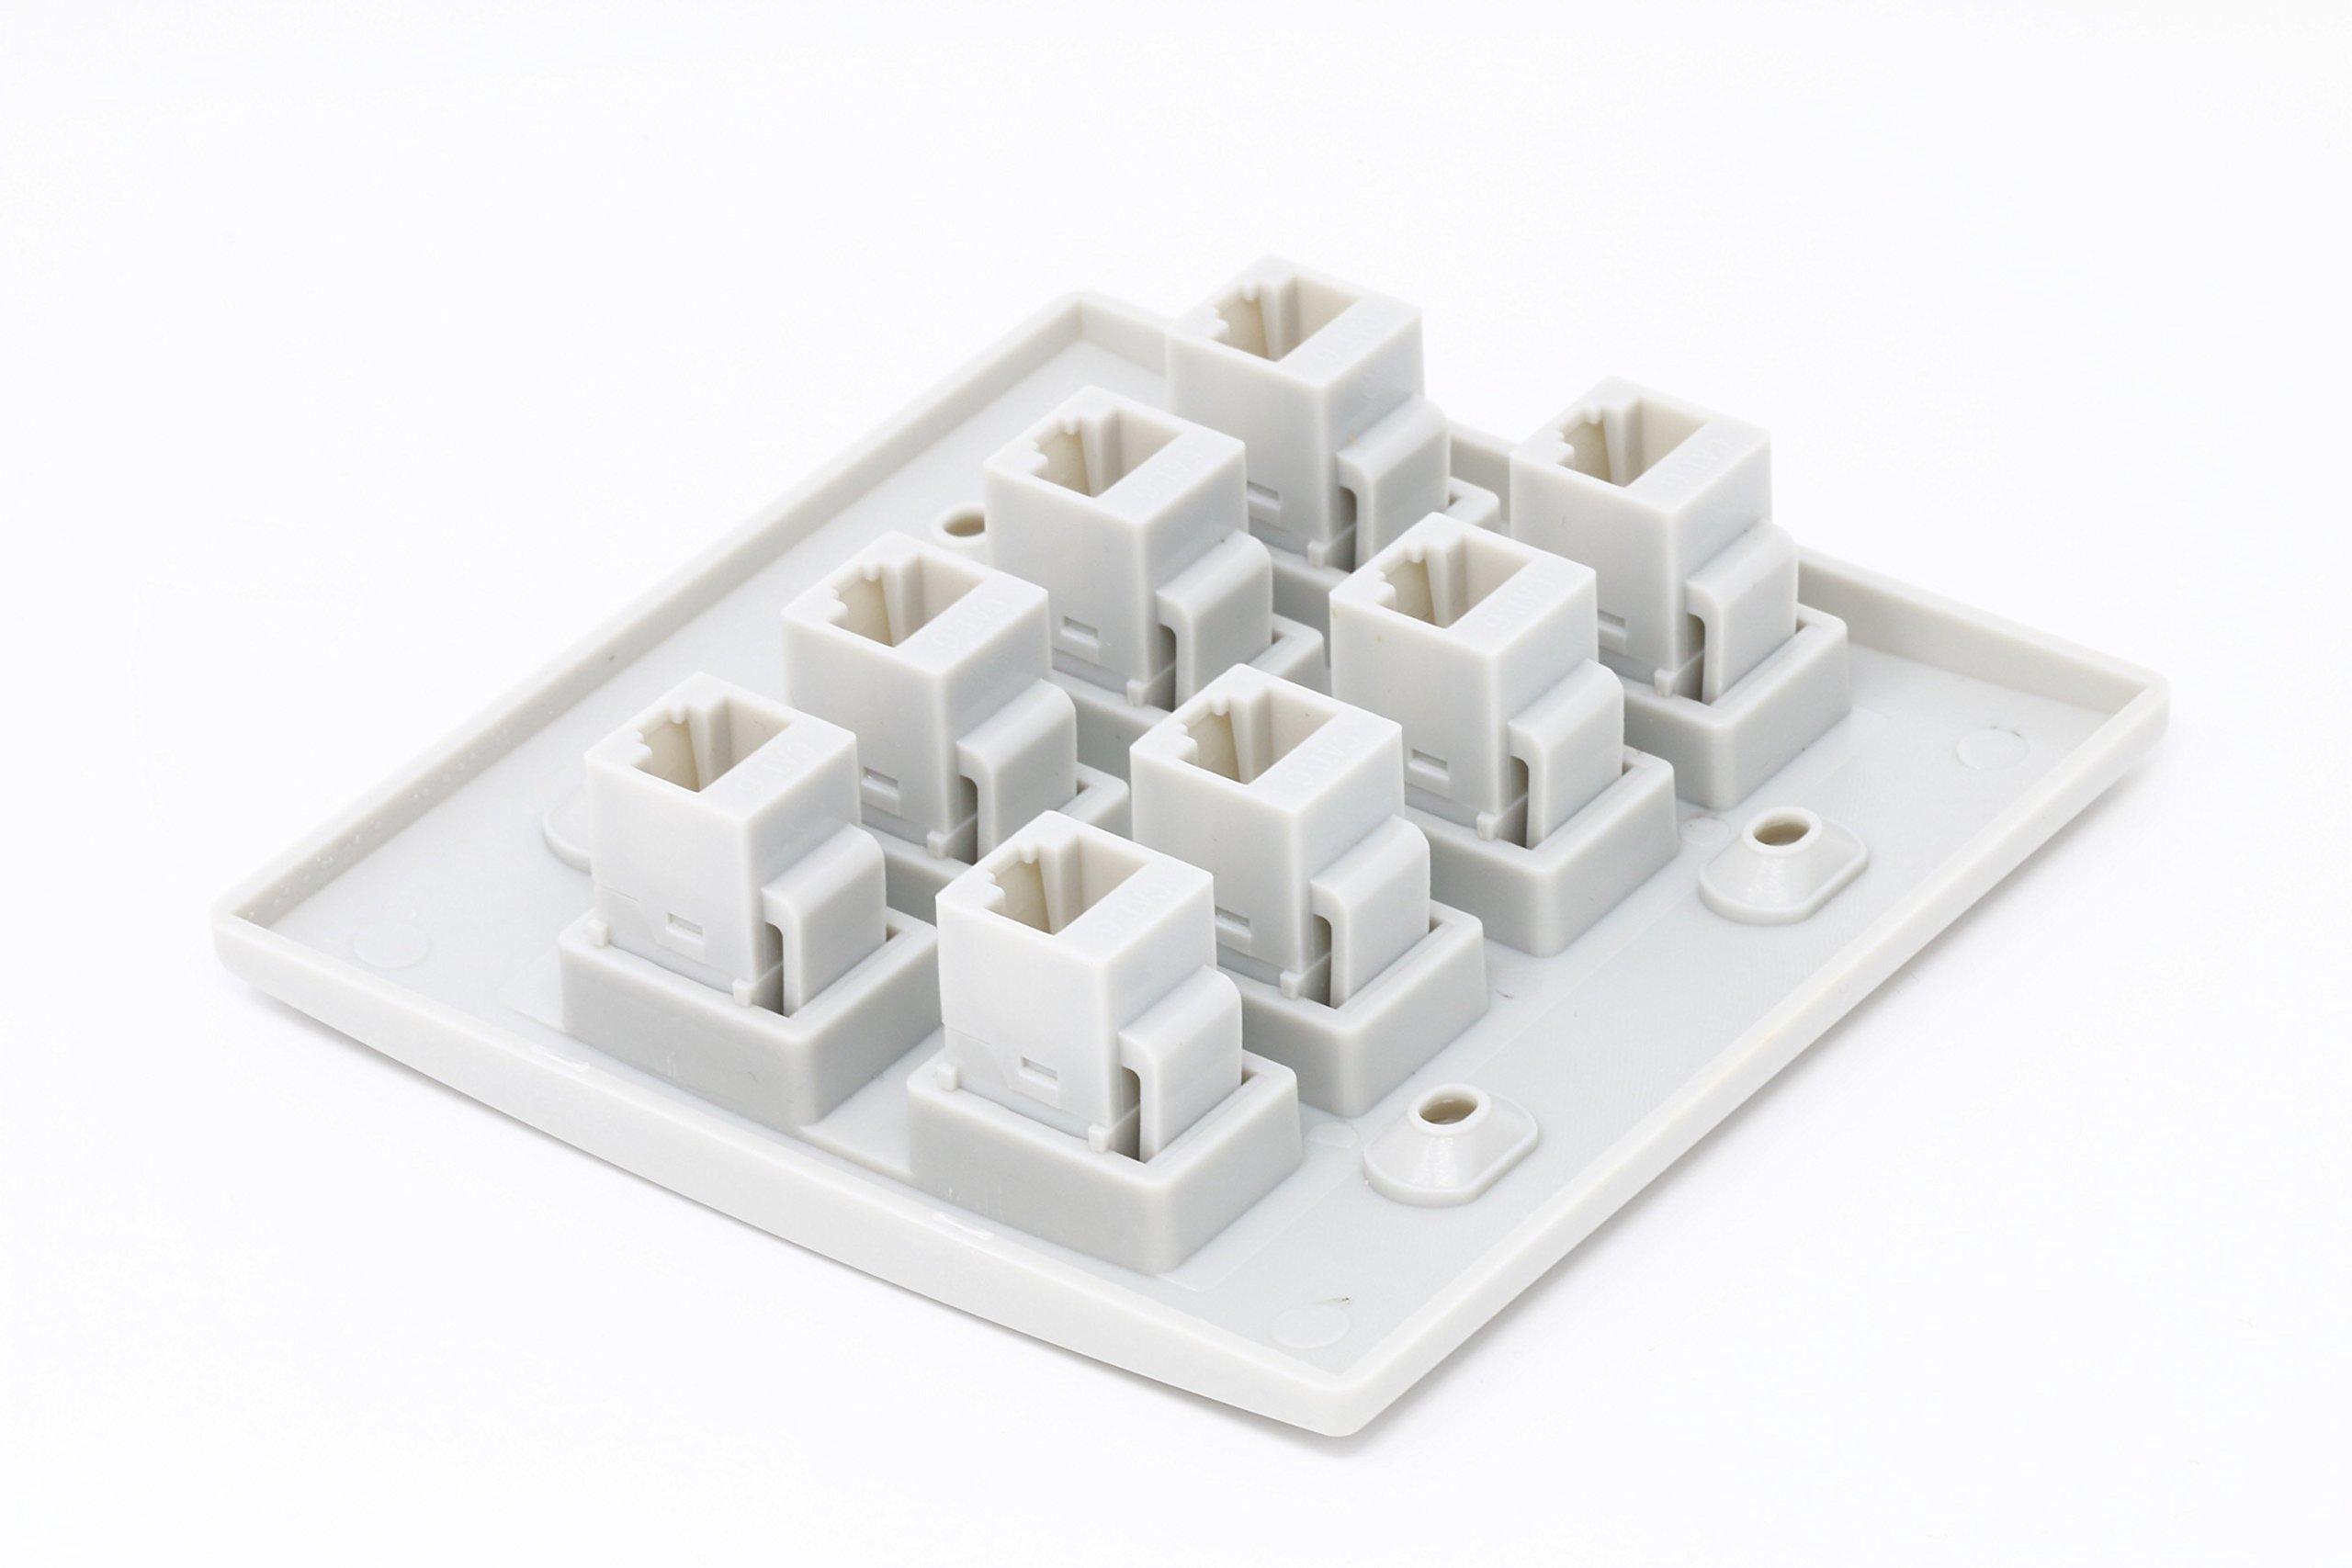 RiteAV 8 Port Flat Dual 2 Gang Ethernet Cat5e RJ45 Network Wall Plate - White by RiteAV